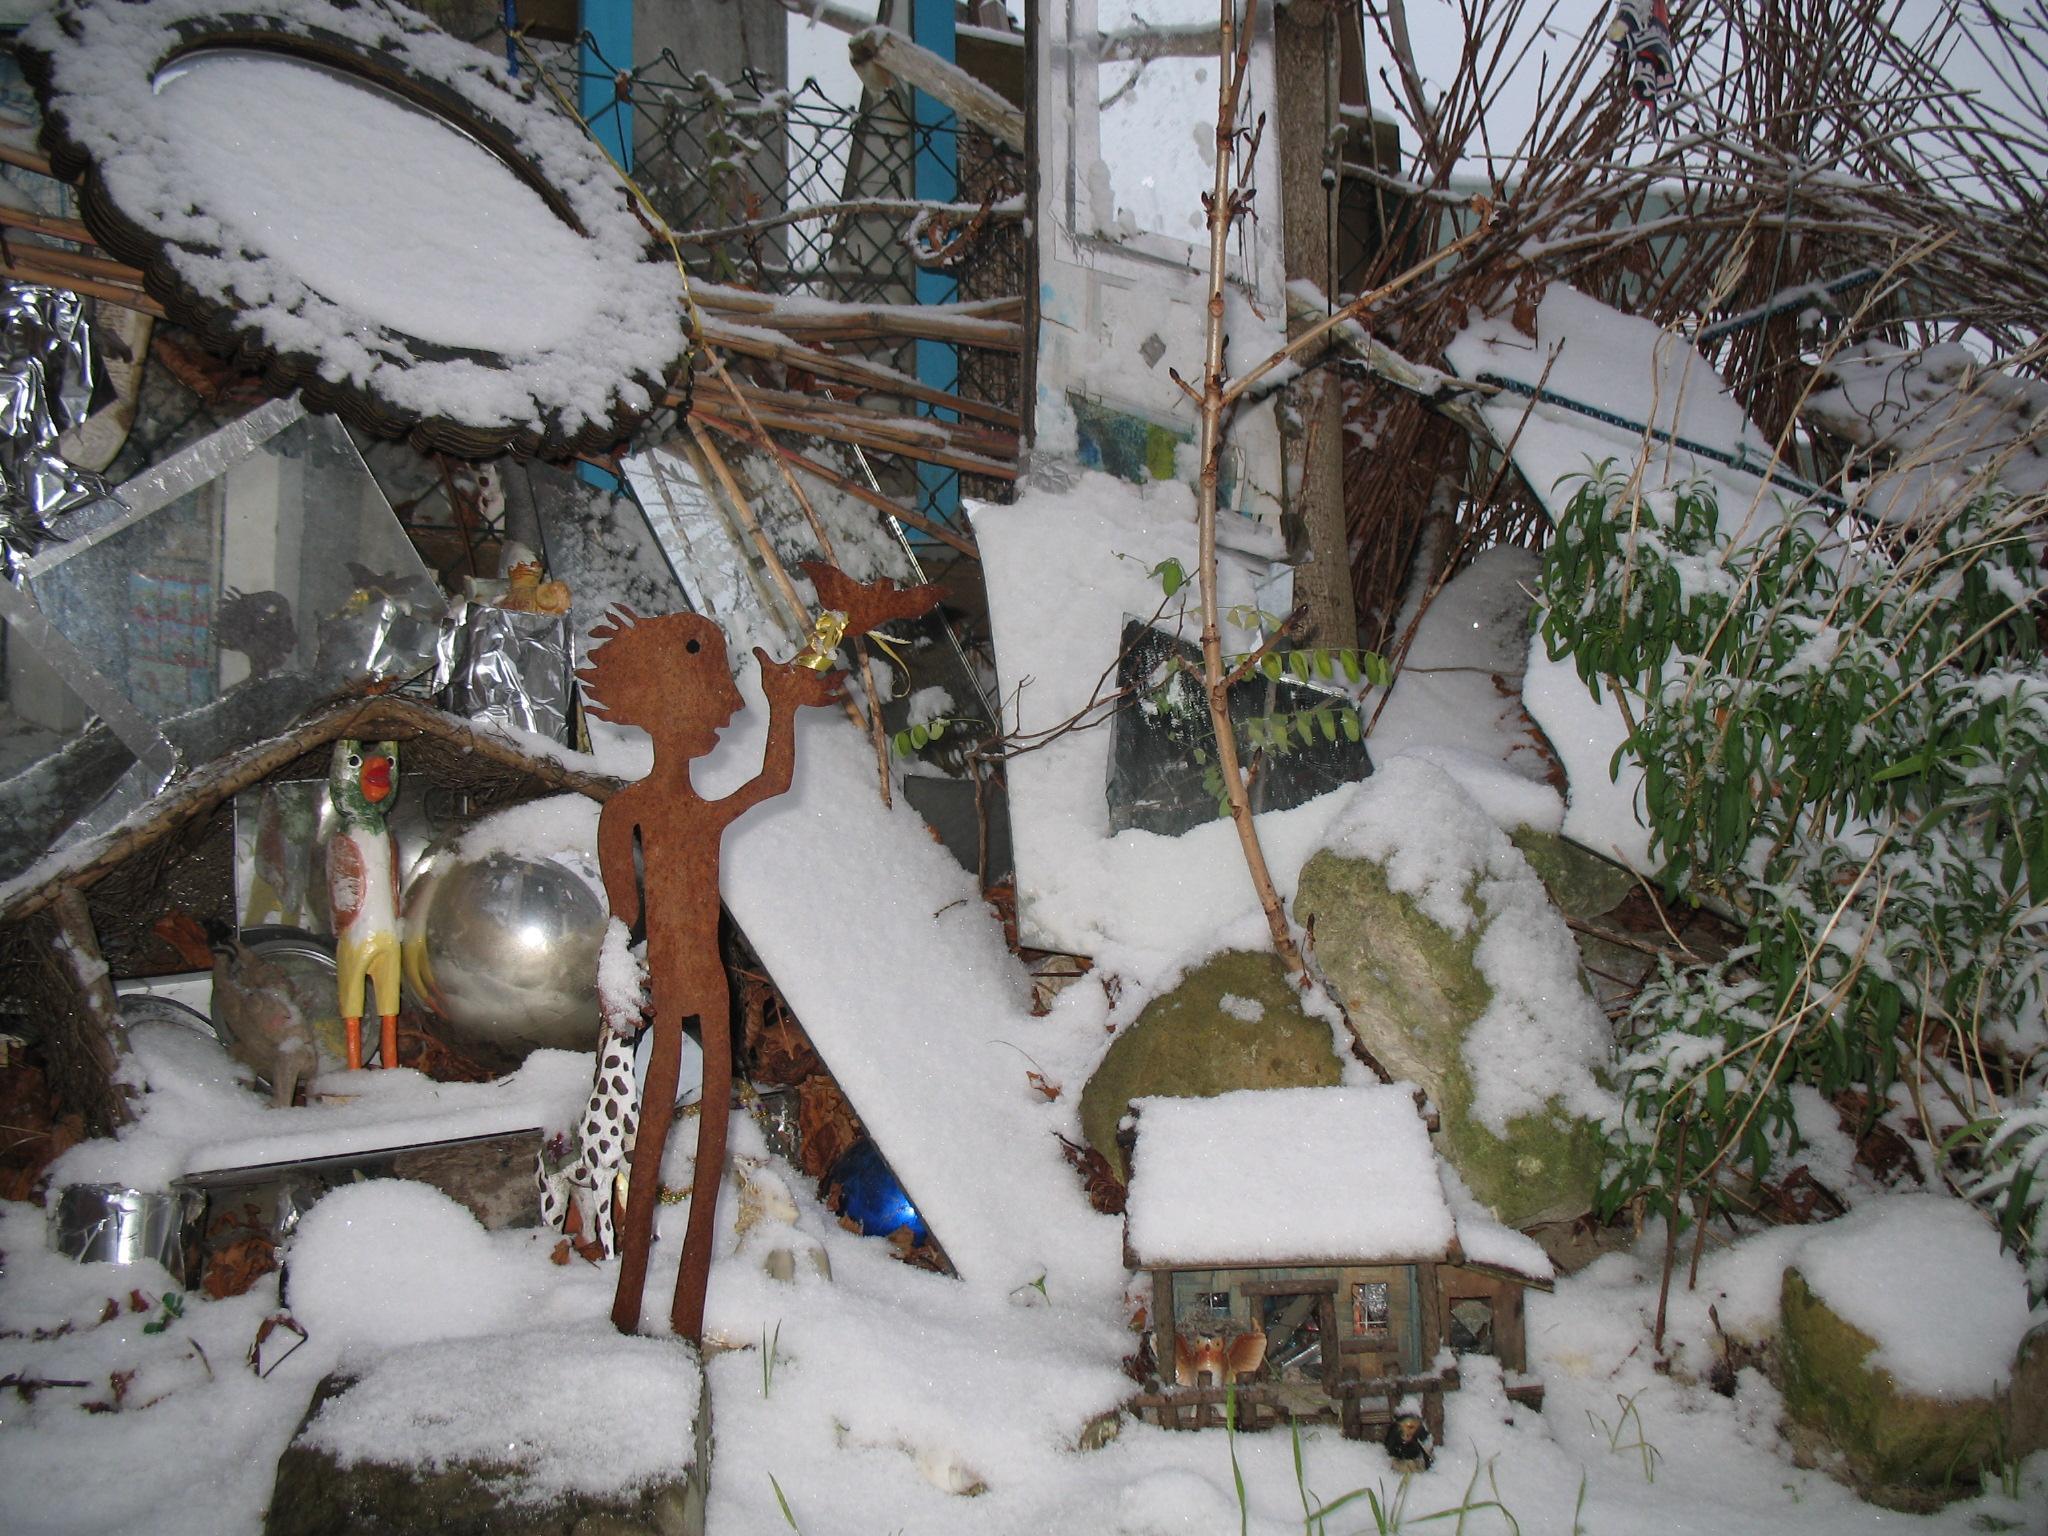 Pays De Neige Winter-snow